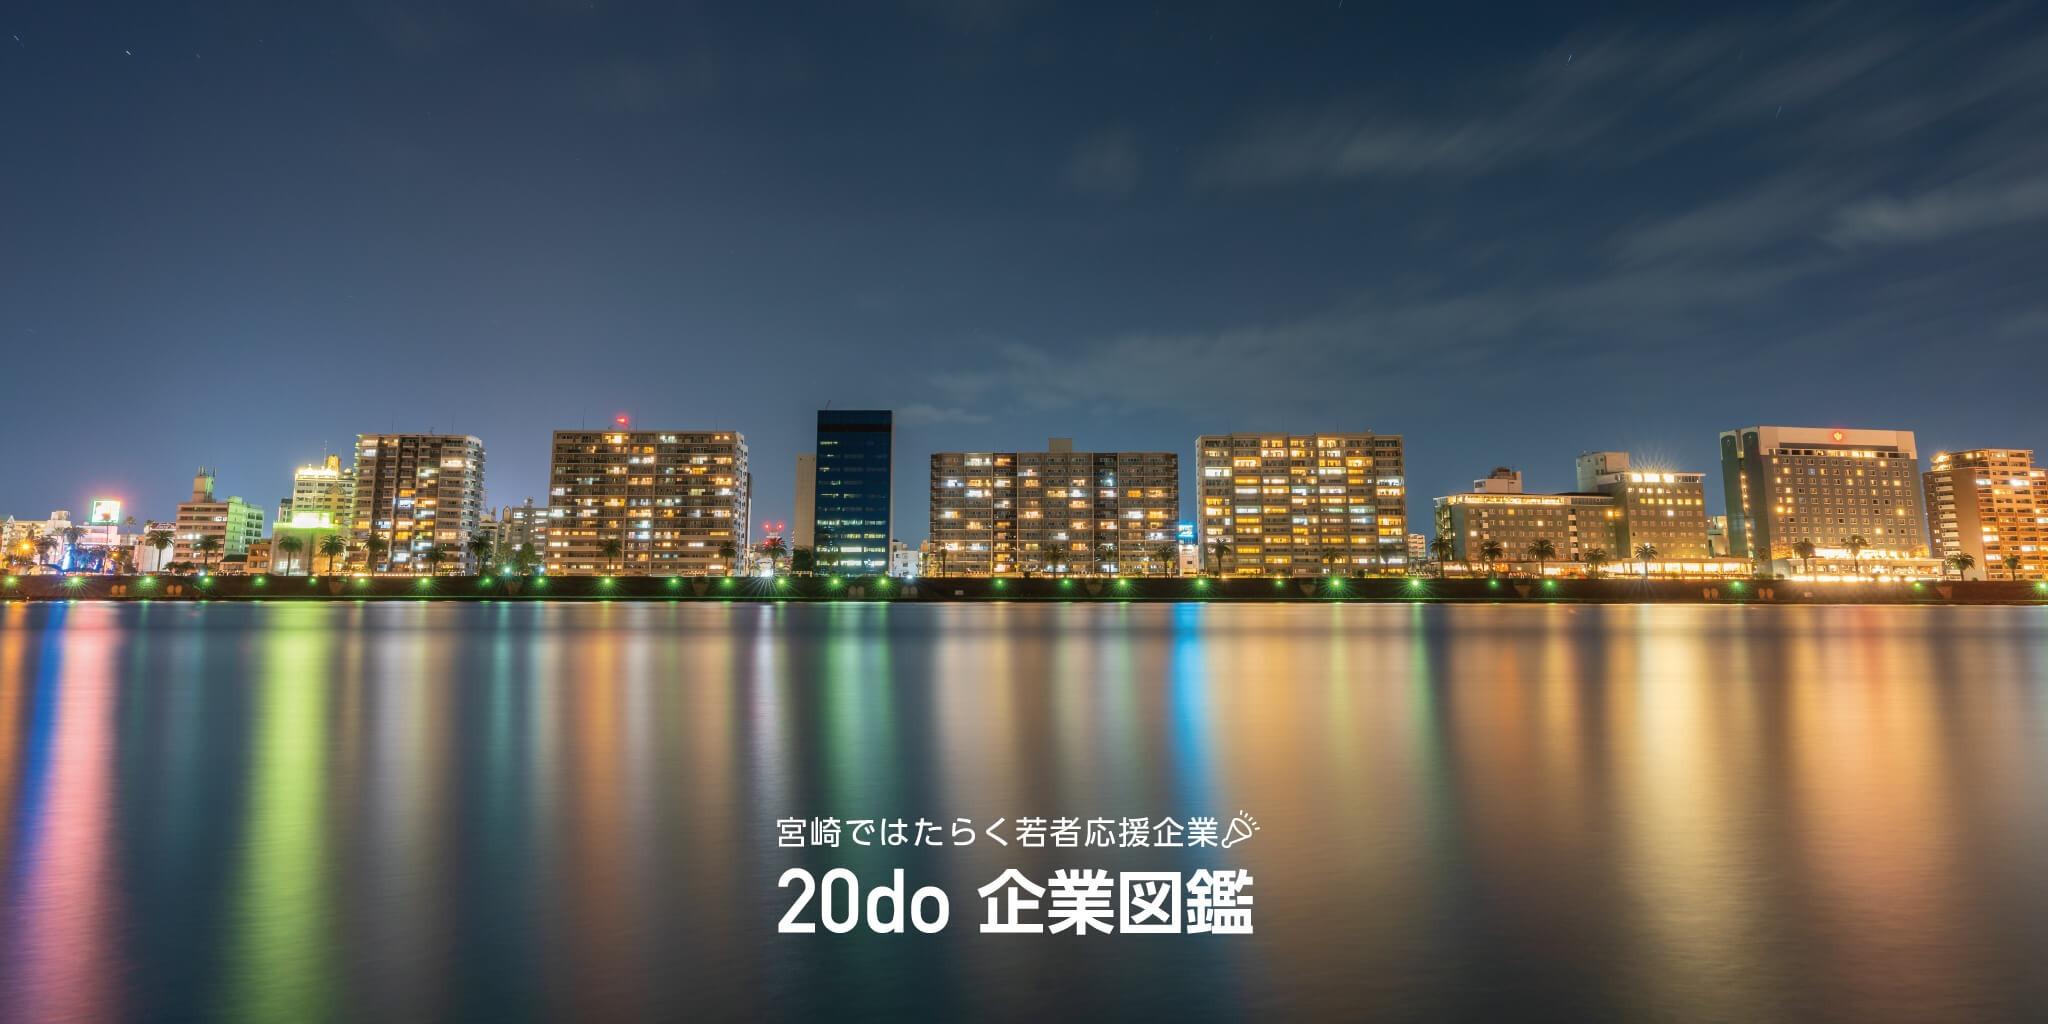 20do 企業図鑑登録企業 連絡会